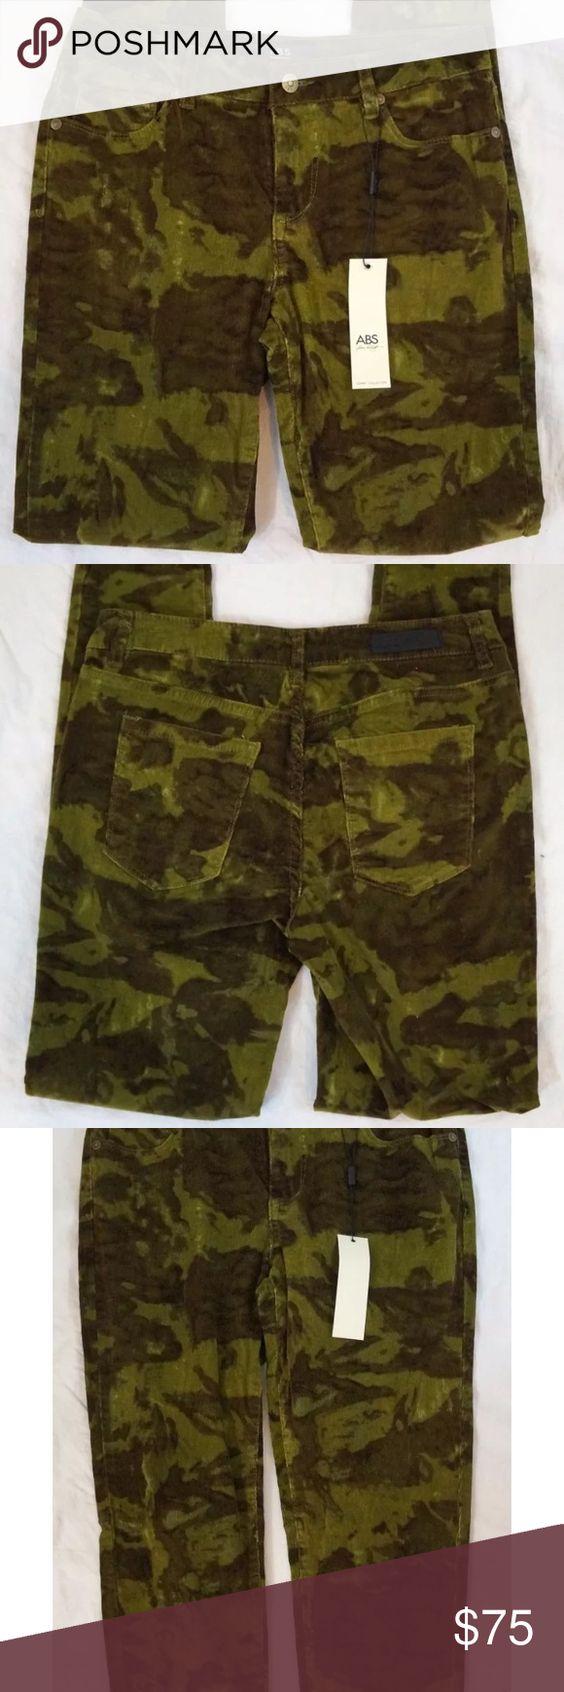 ABS anthro skinny leg camo corduroy pants sz 27 NWT | D, Abs and Pants